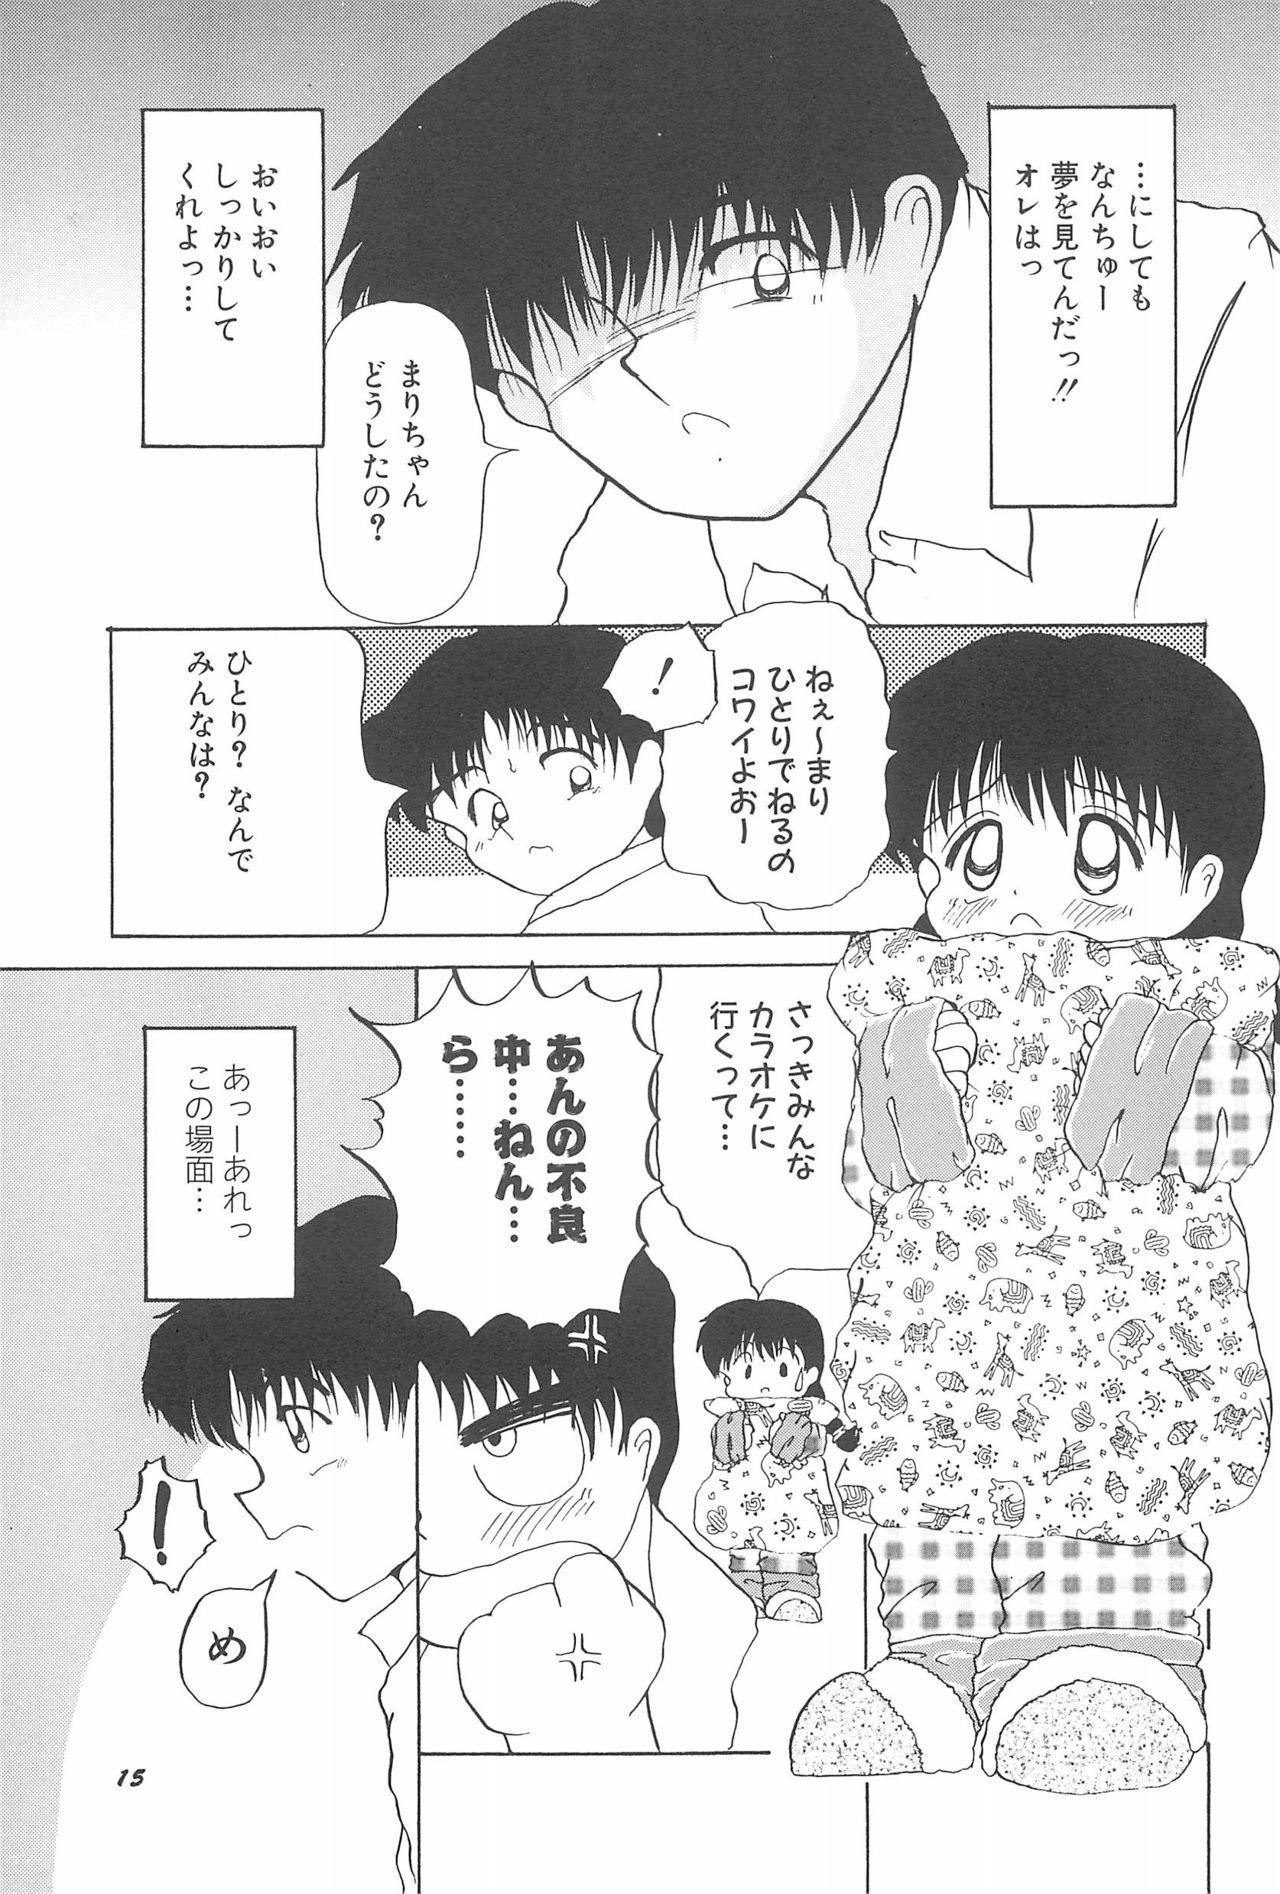 Aoi Shojokyuu 20